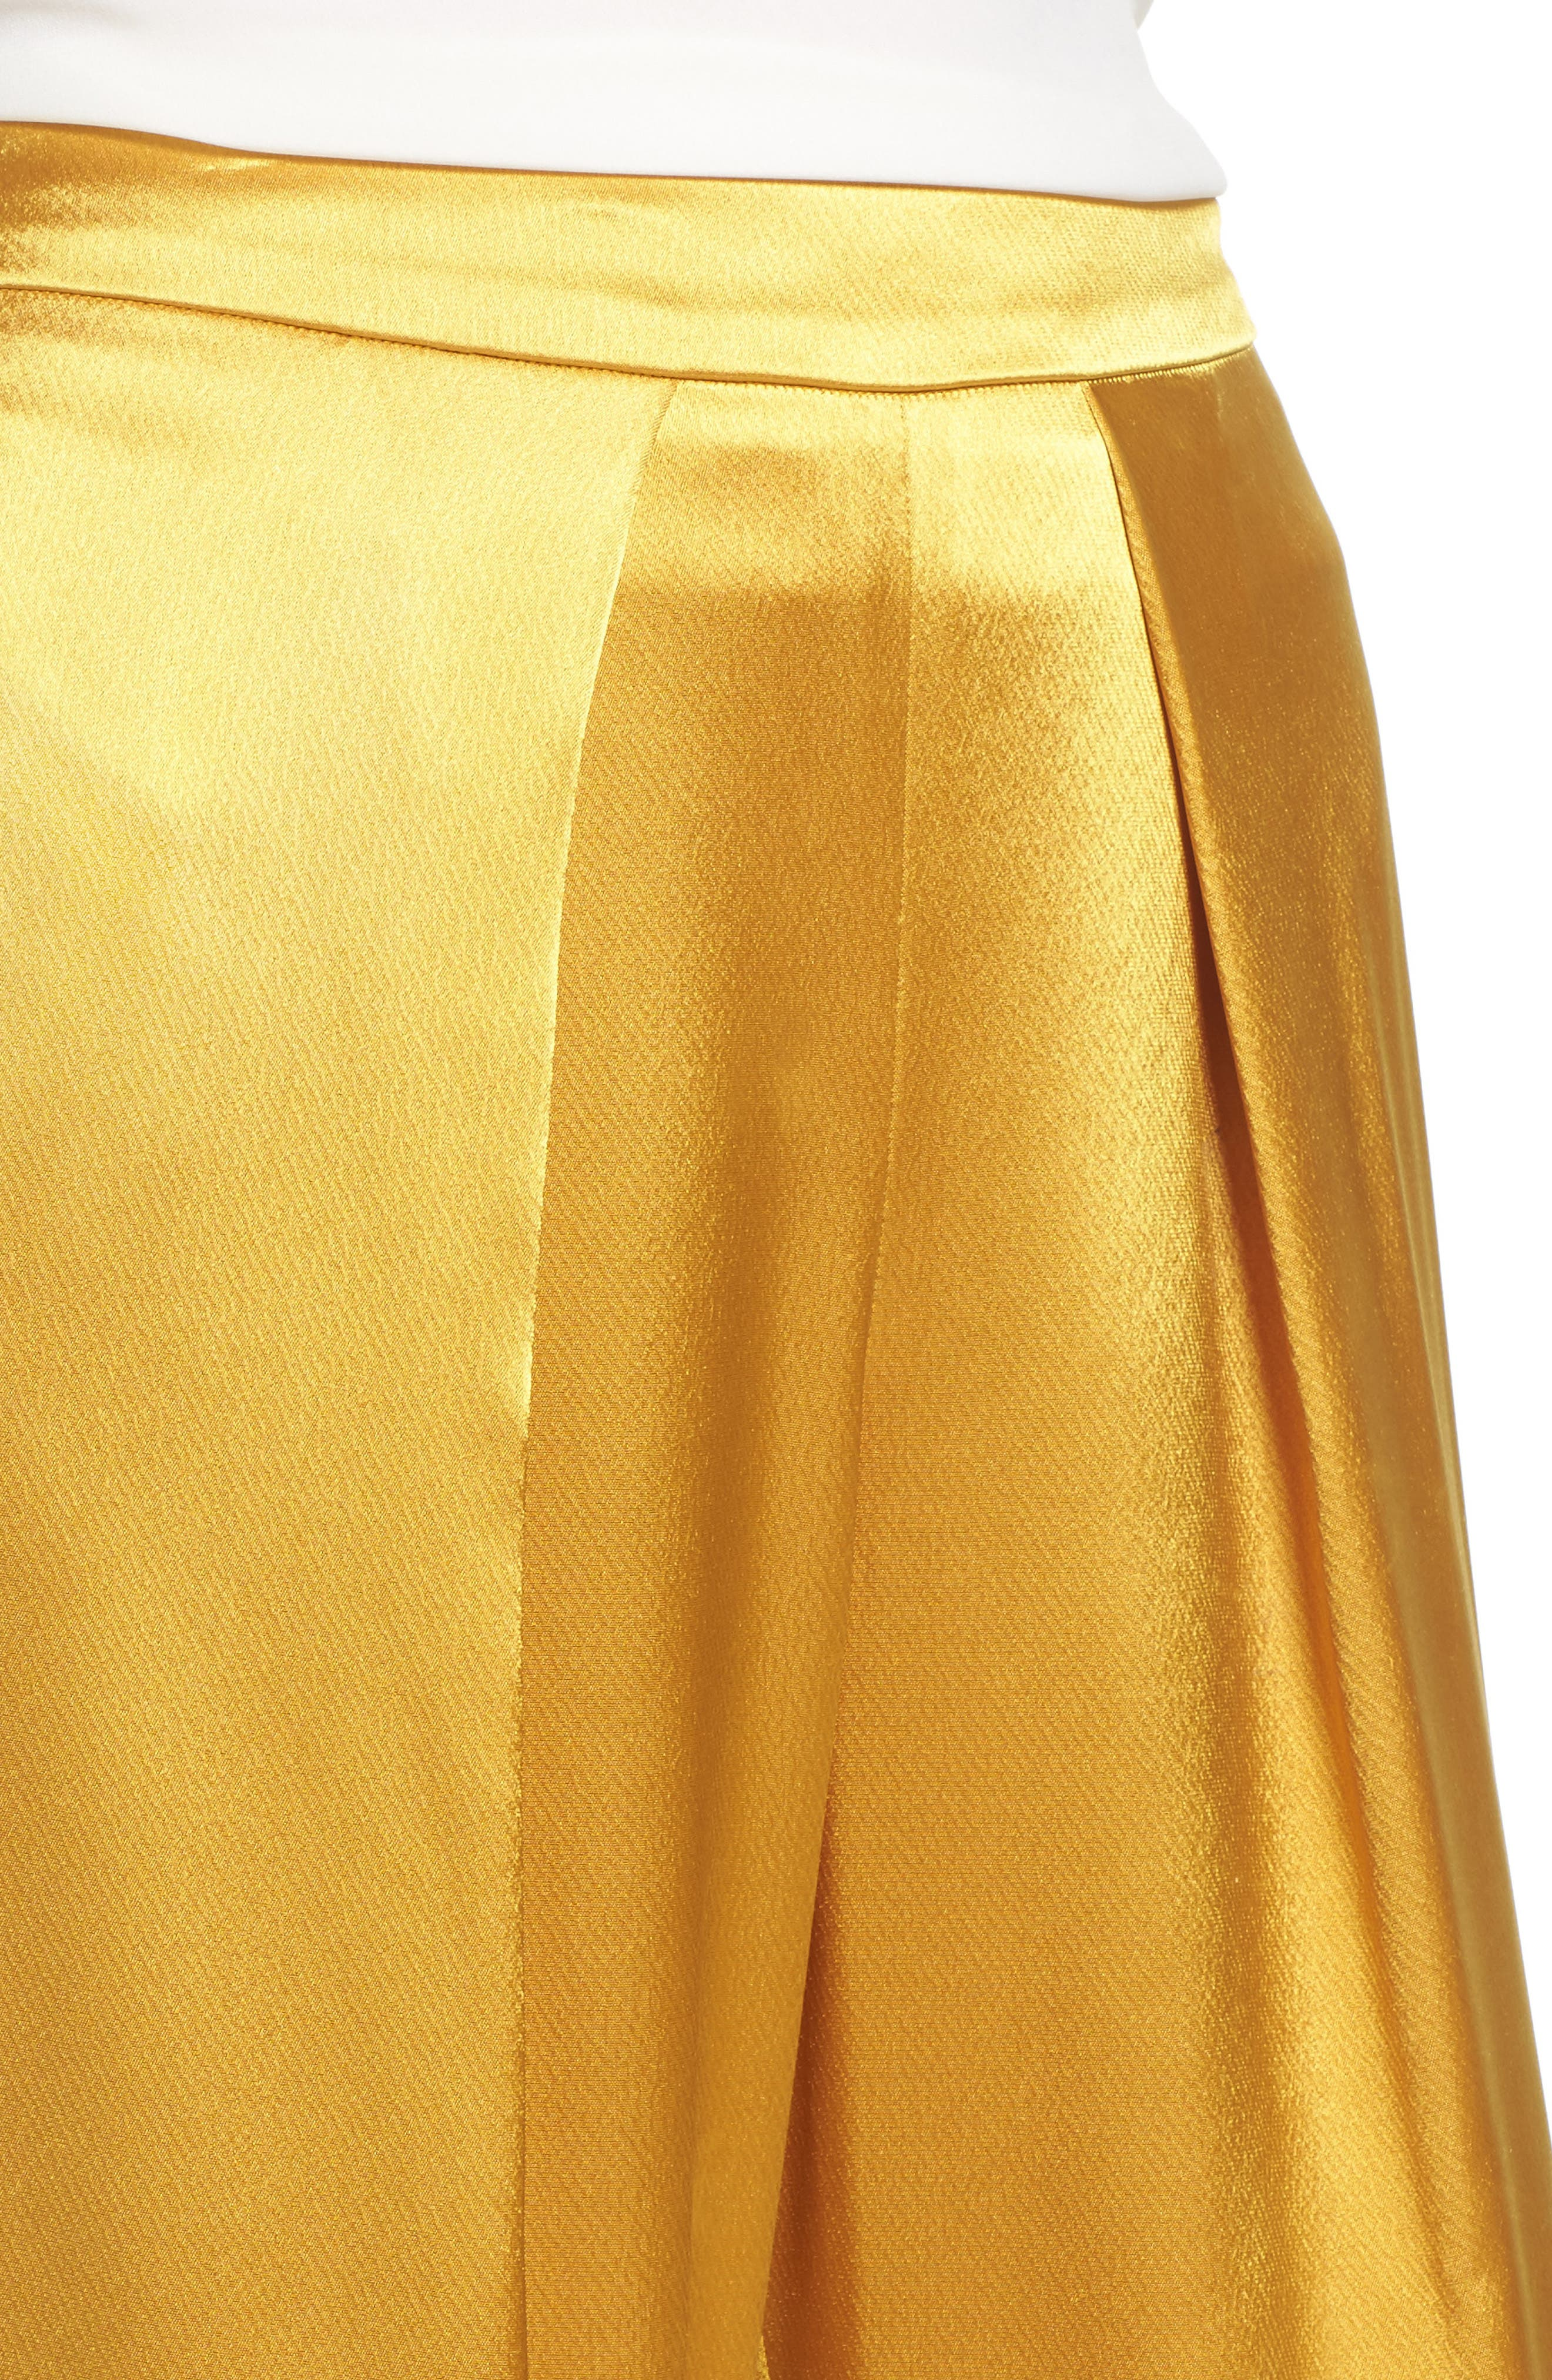 Fancy Pleated Front Satin Pants,                             Alternate thumbnail 4, color,                             700